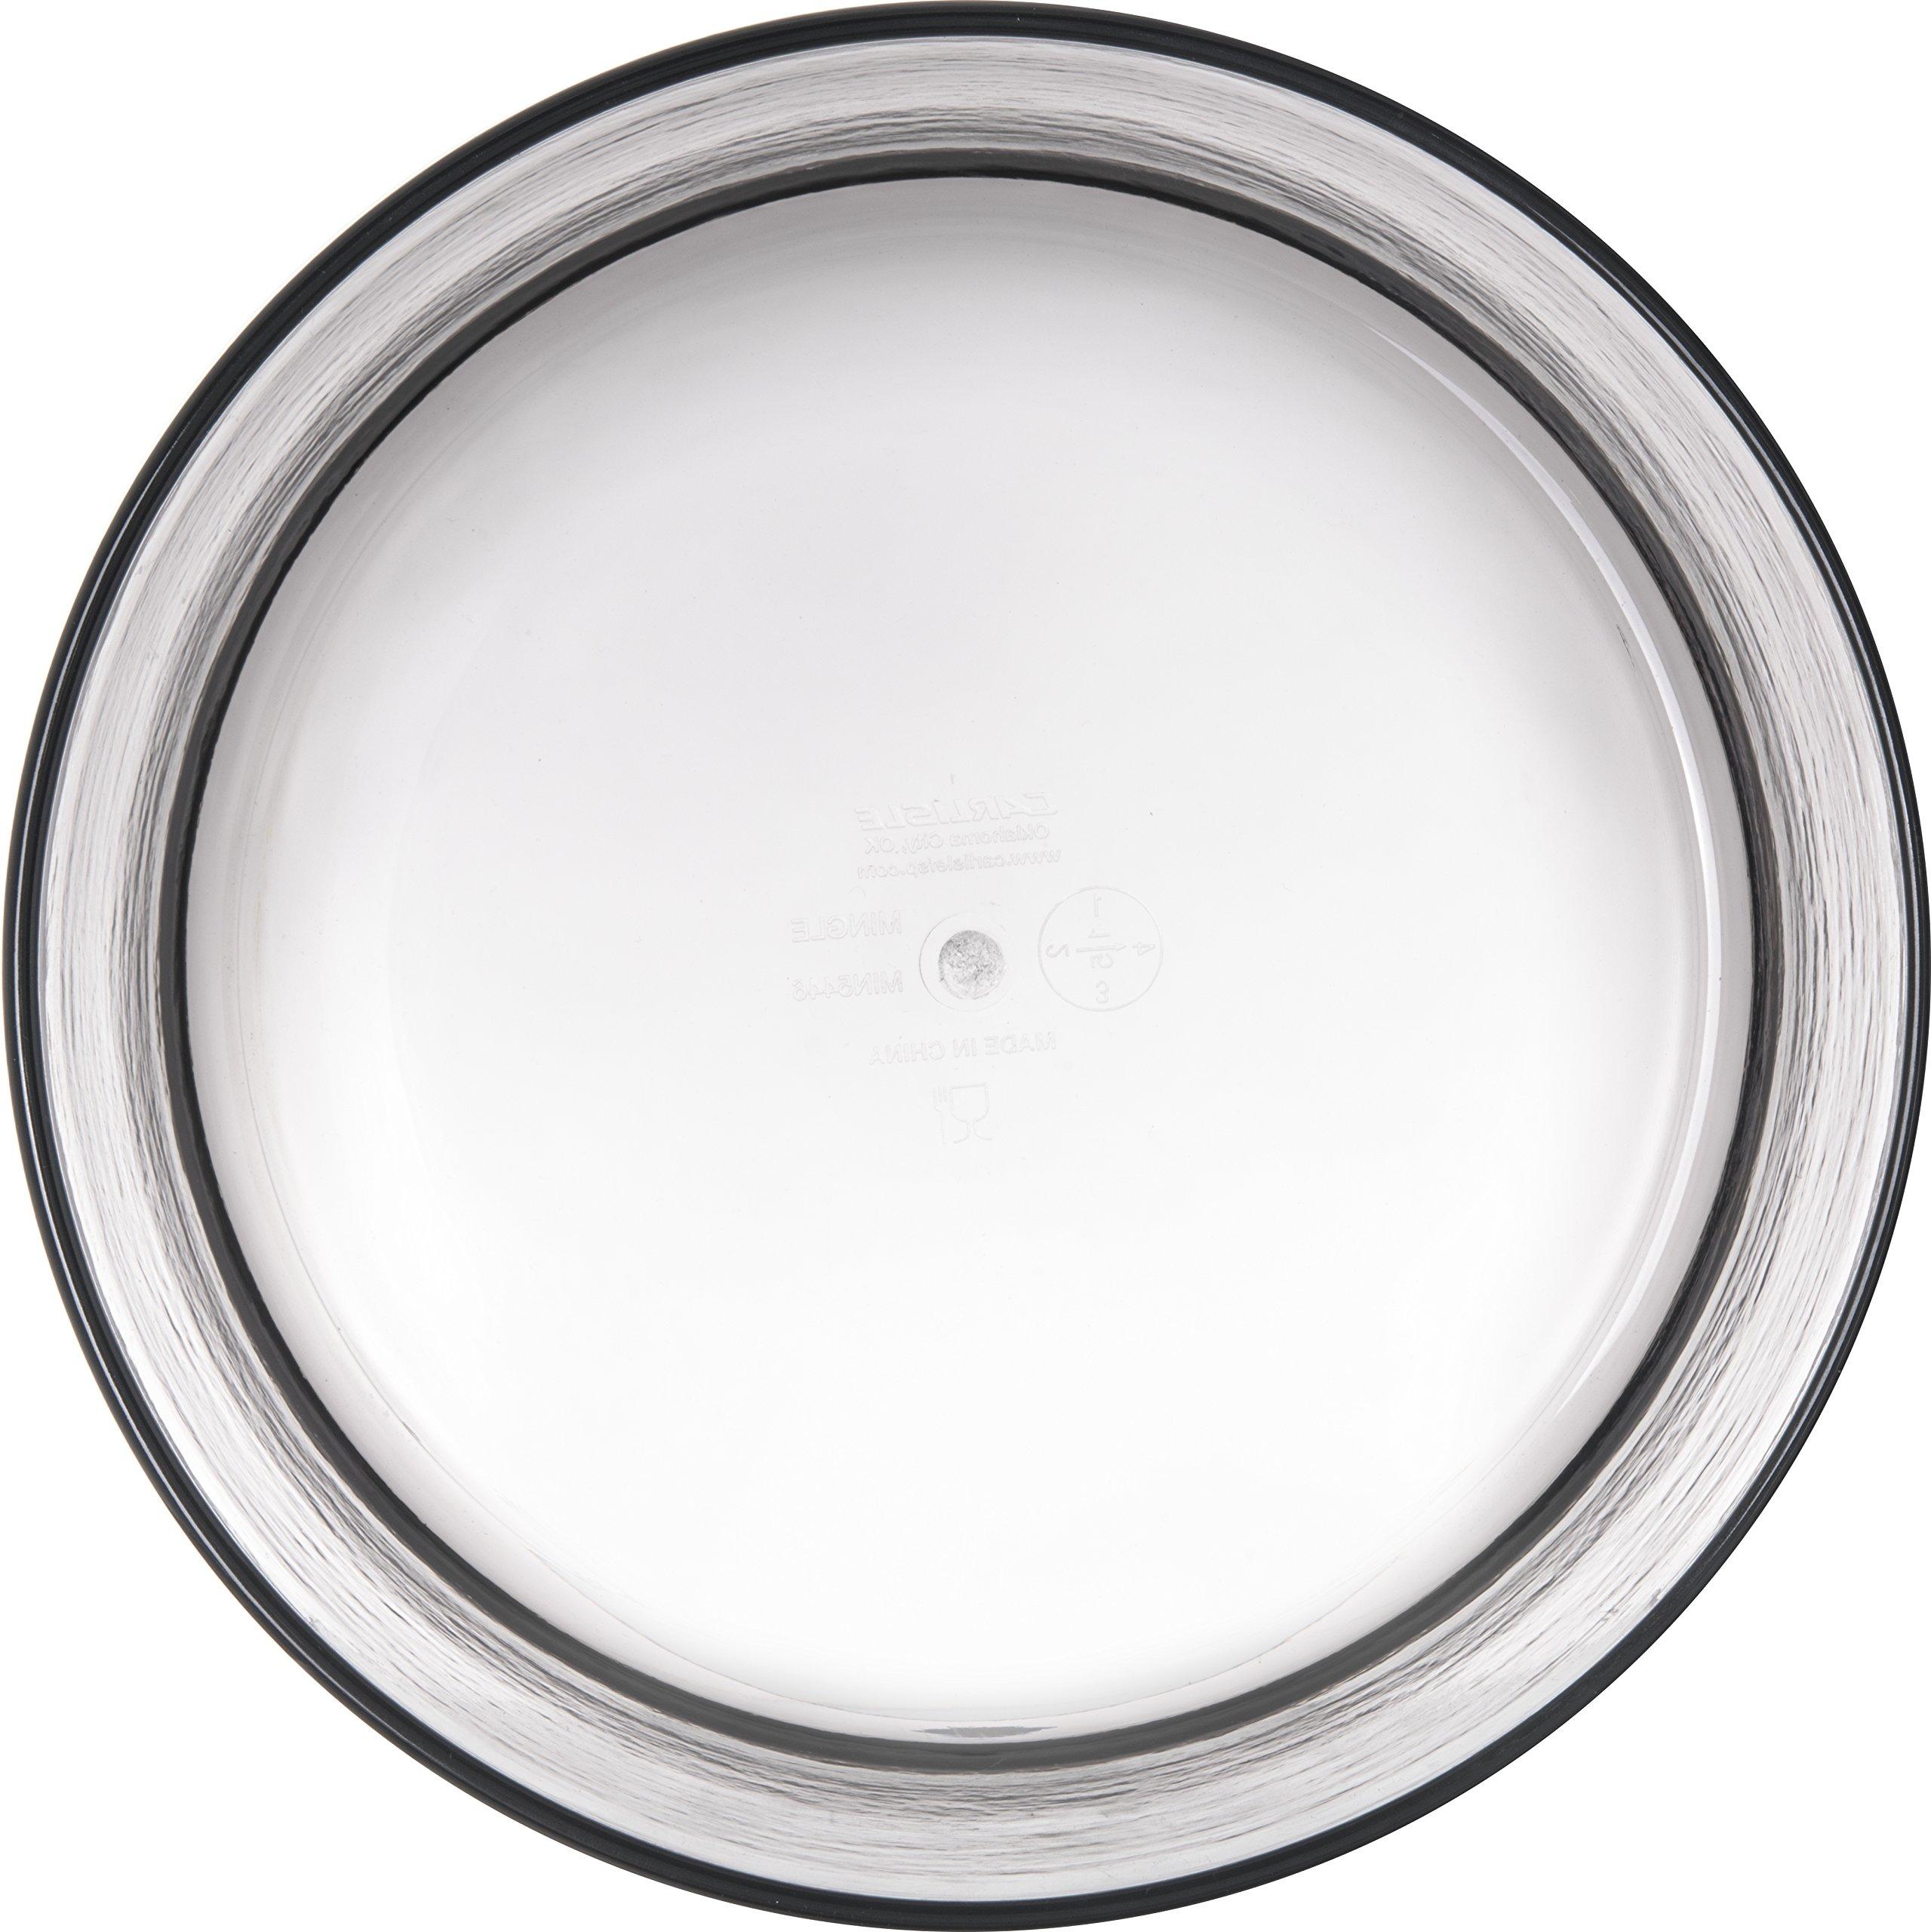 Carlisle MIN544618 Mingle Serving Bowl, 10'', Tritan, Smoke (Pack of 4) by Carlisle (Image #2)